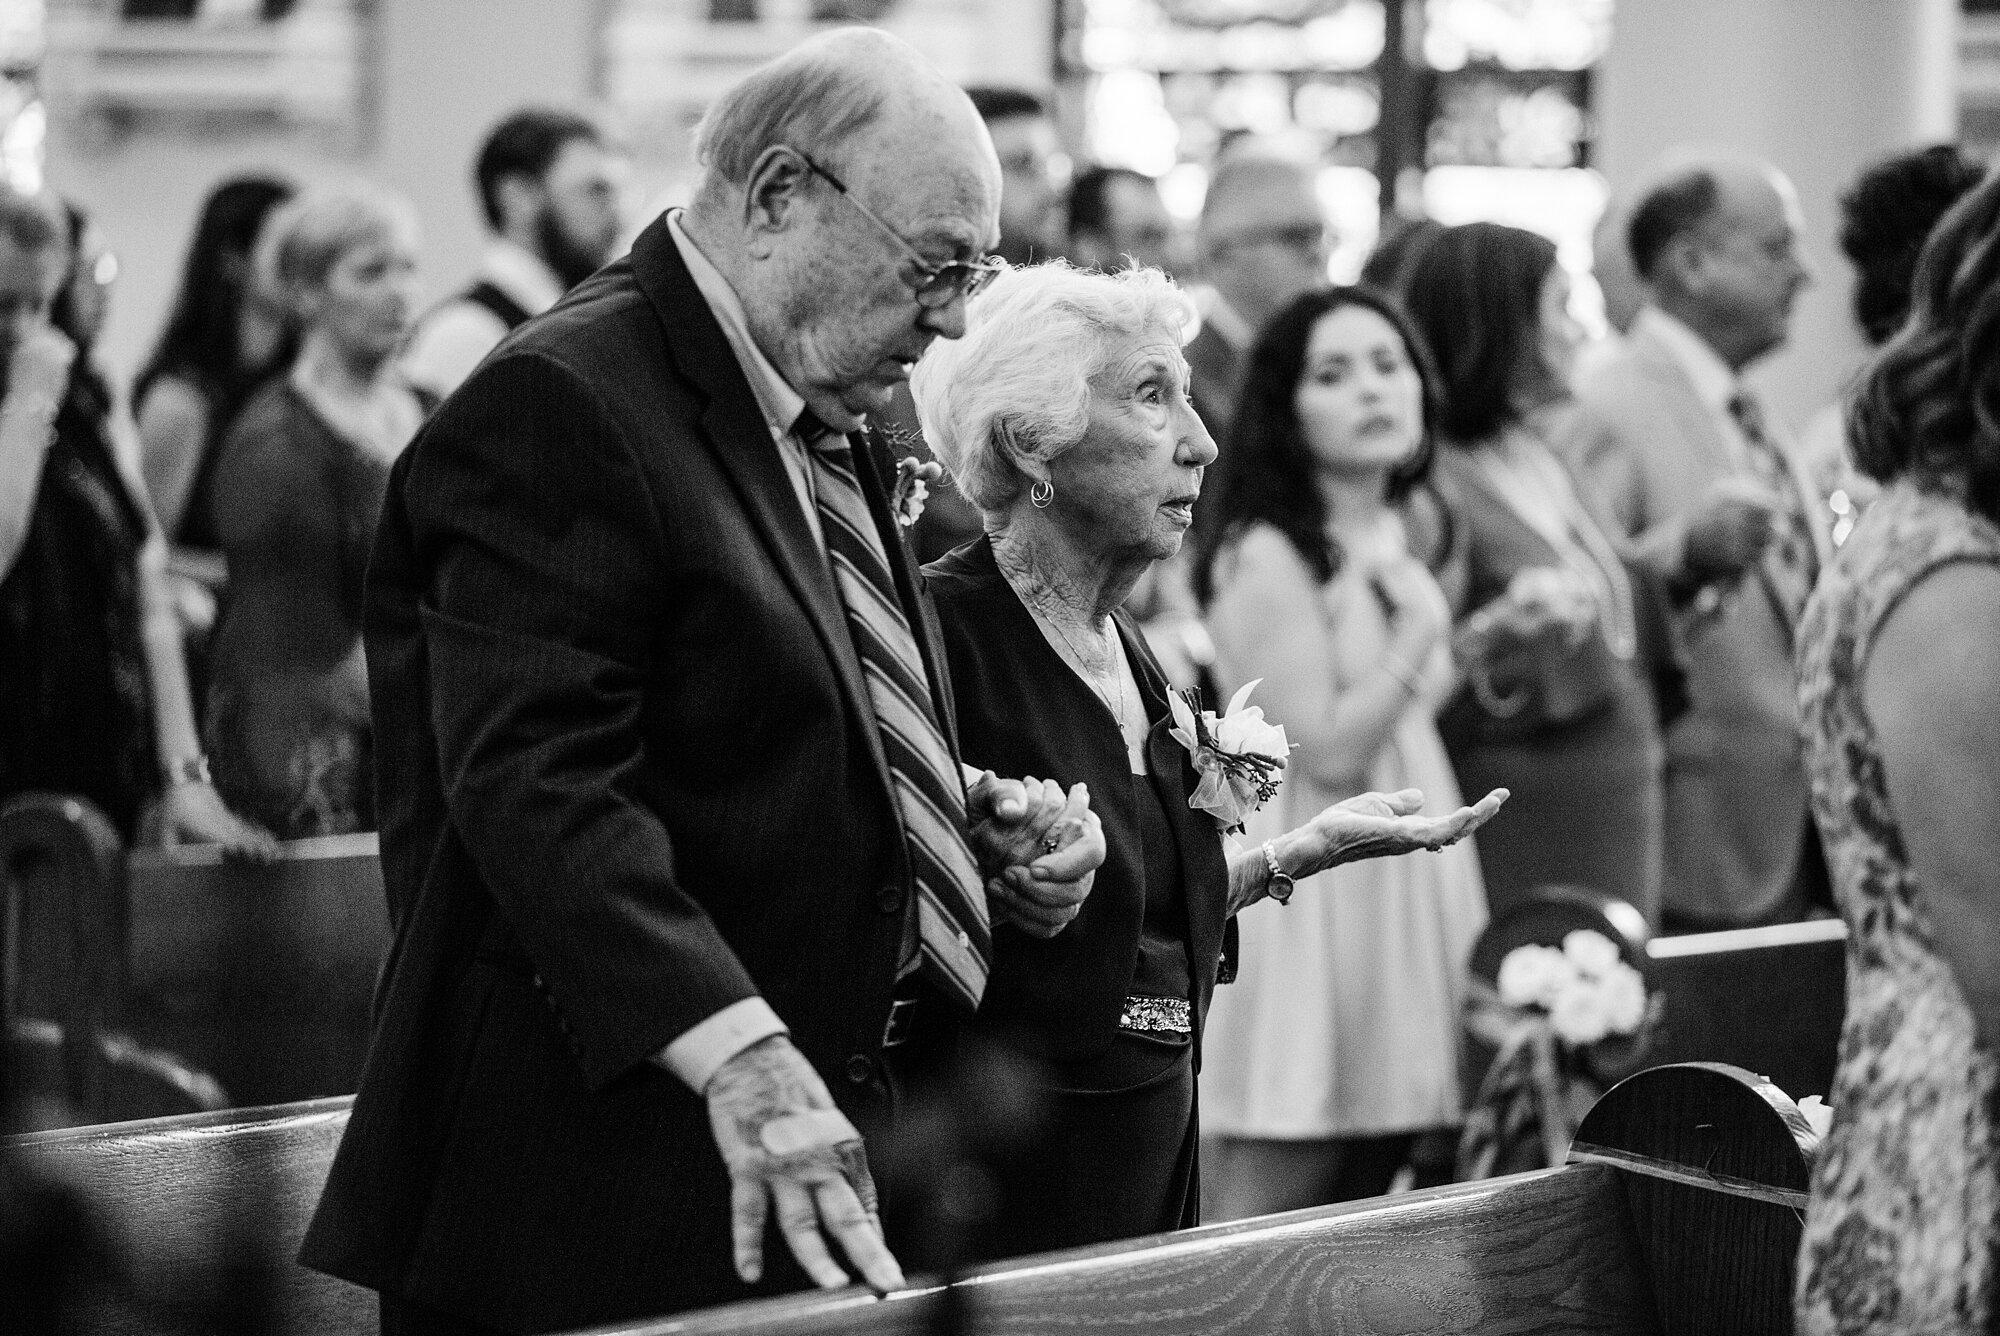 Bay_St_Louis_Wedding_Photographer_0536.jpg